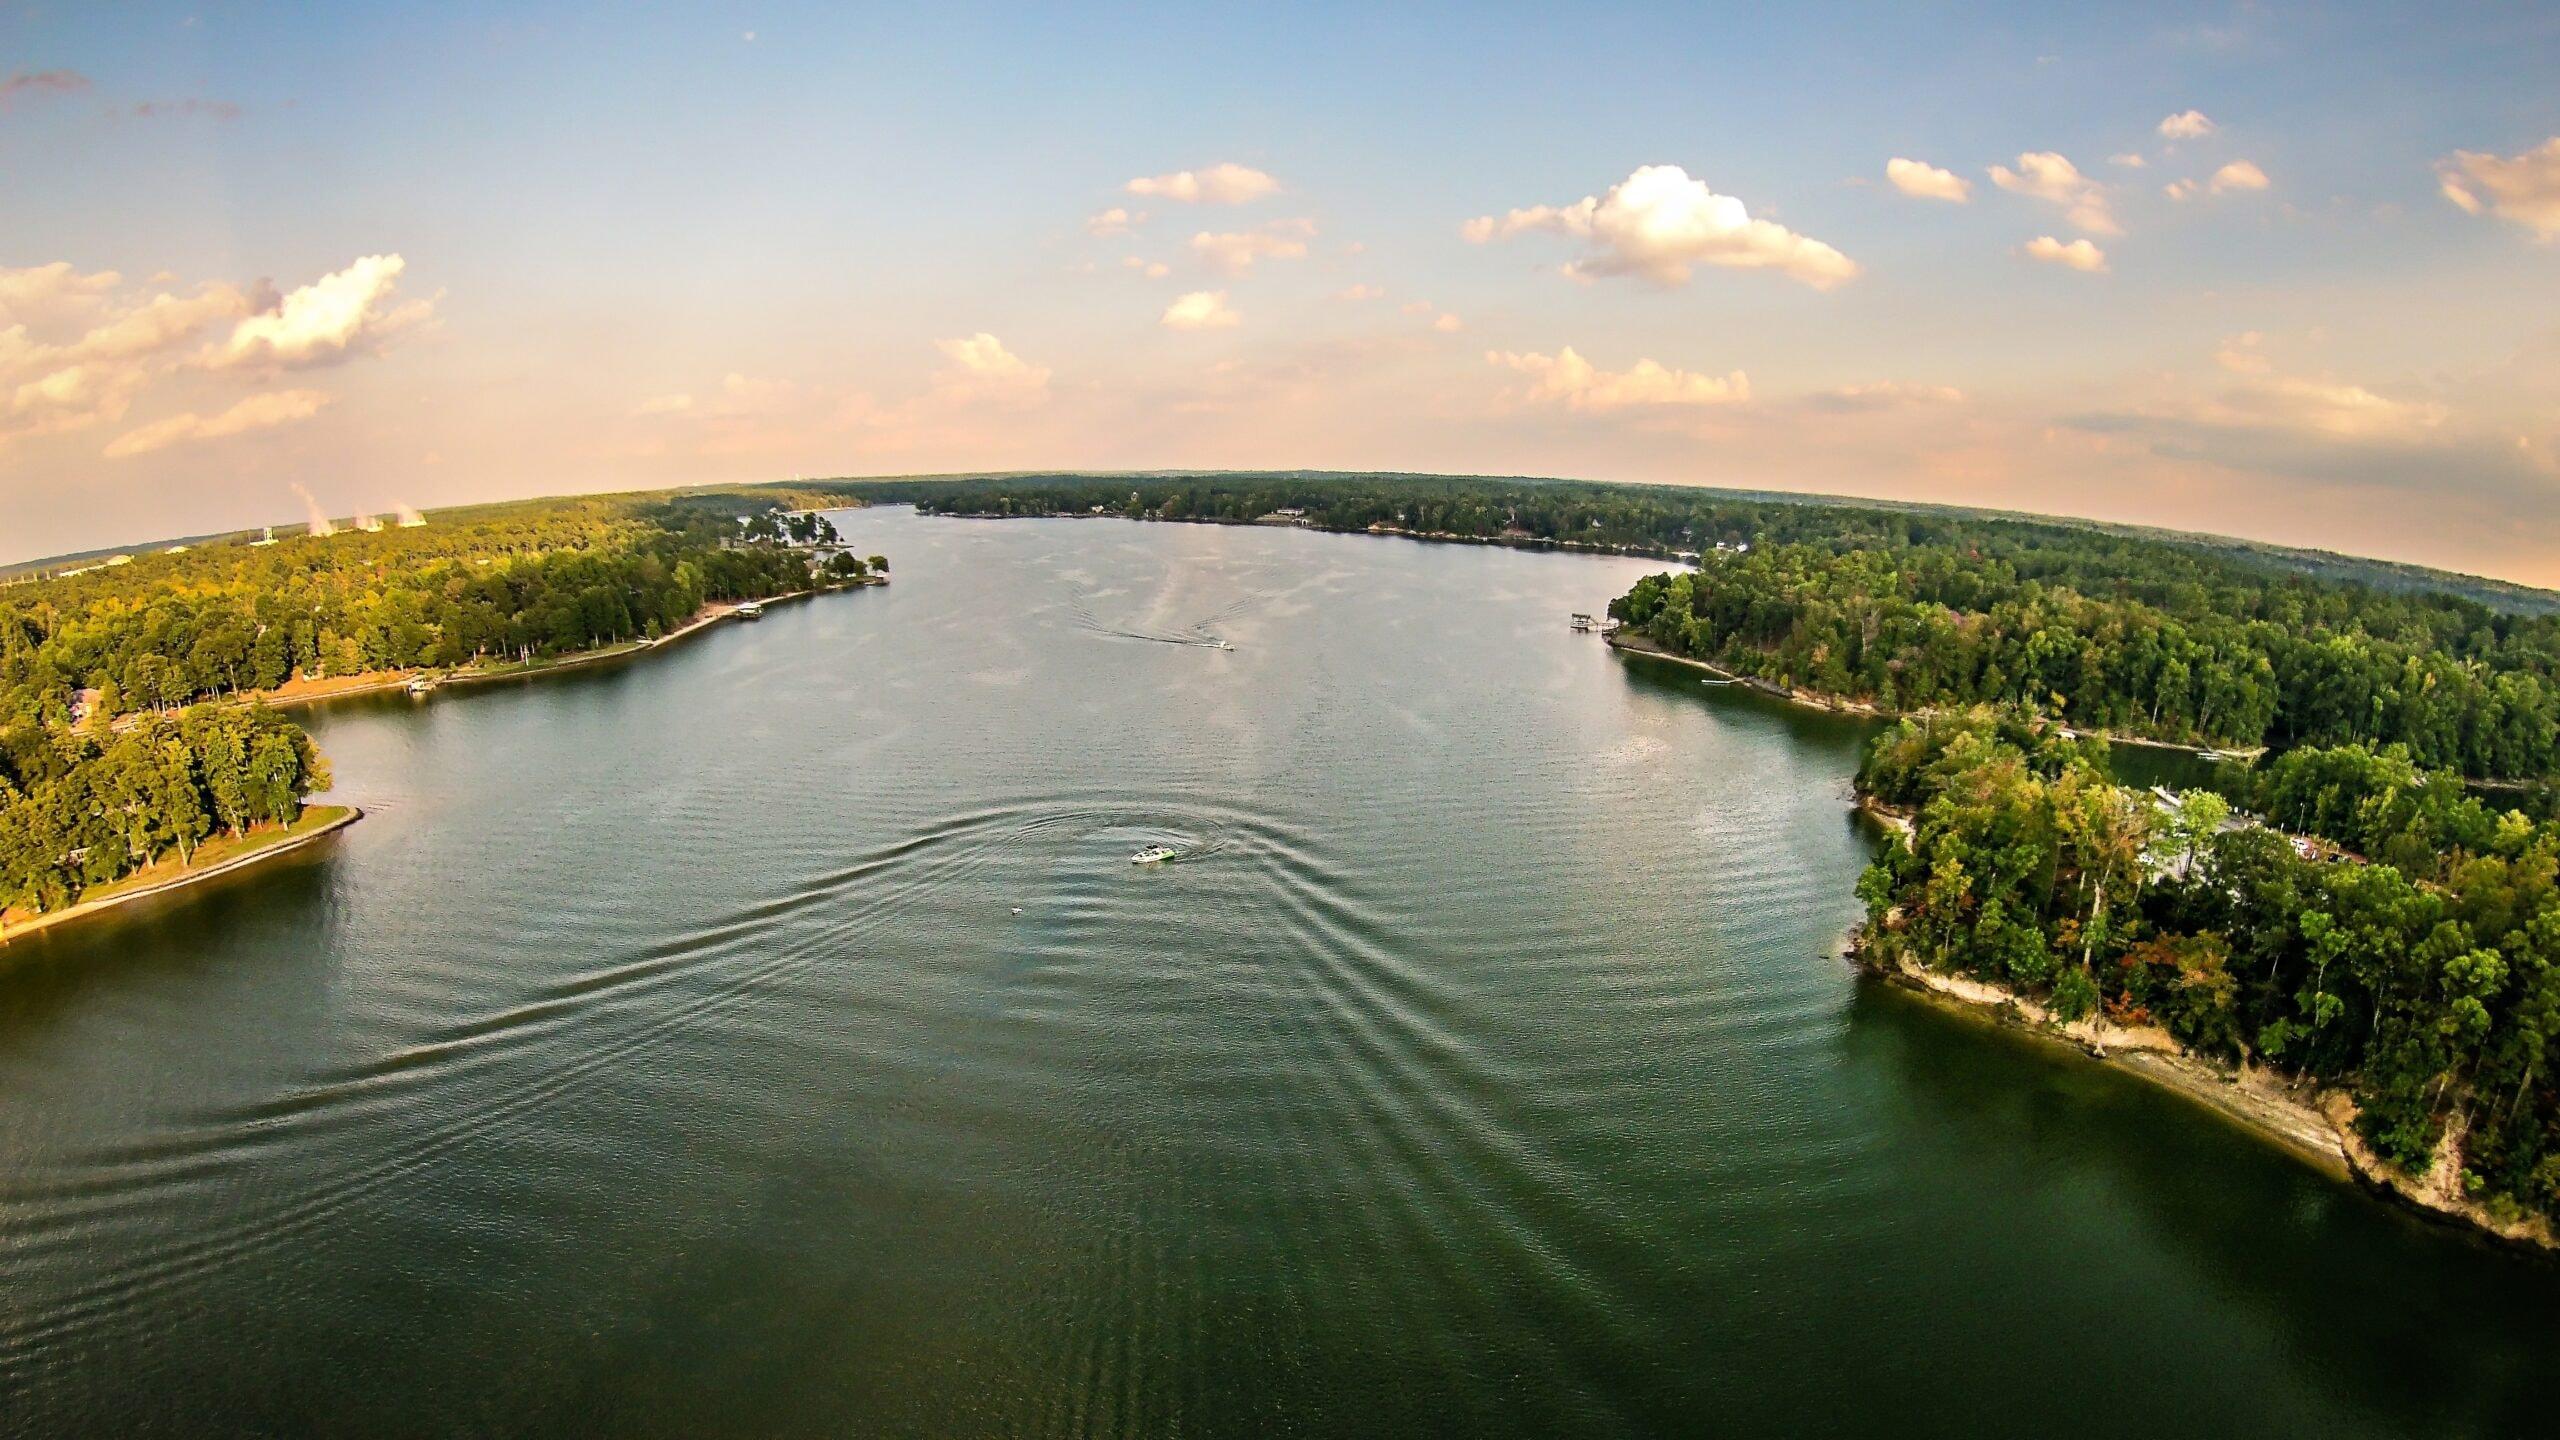 Lake Wylie, South Carolina